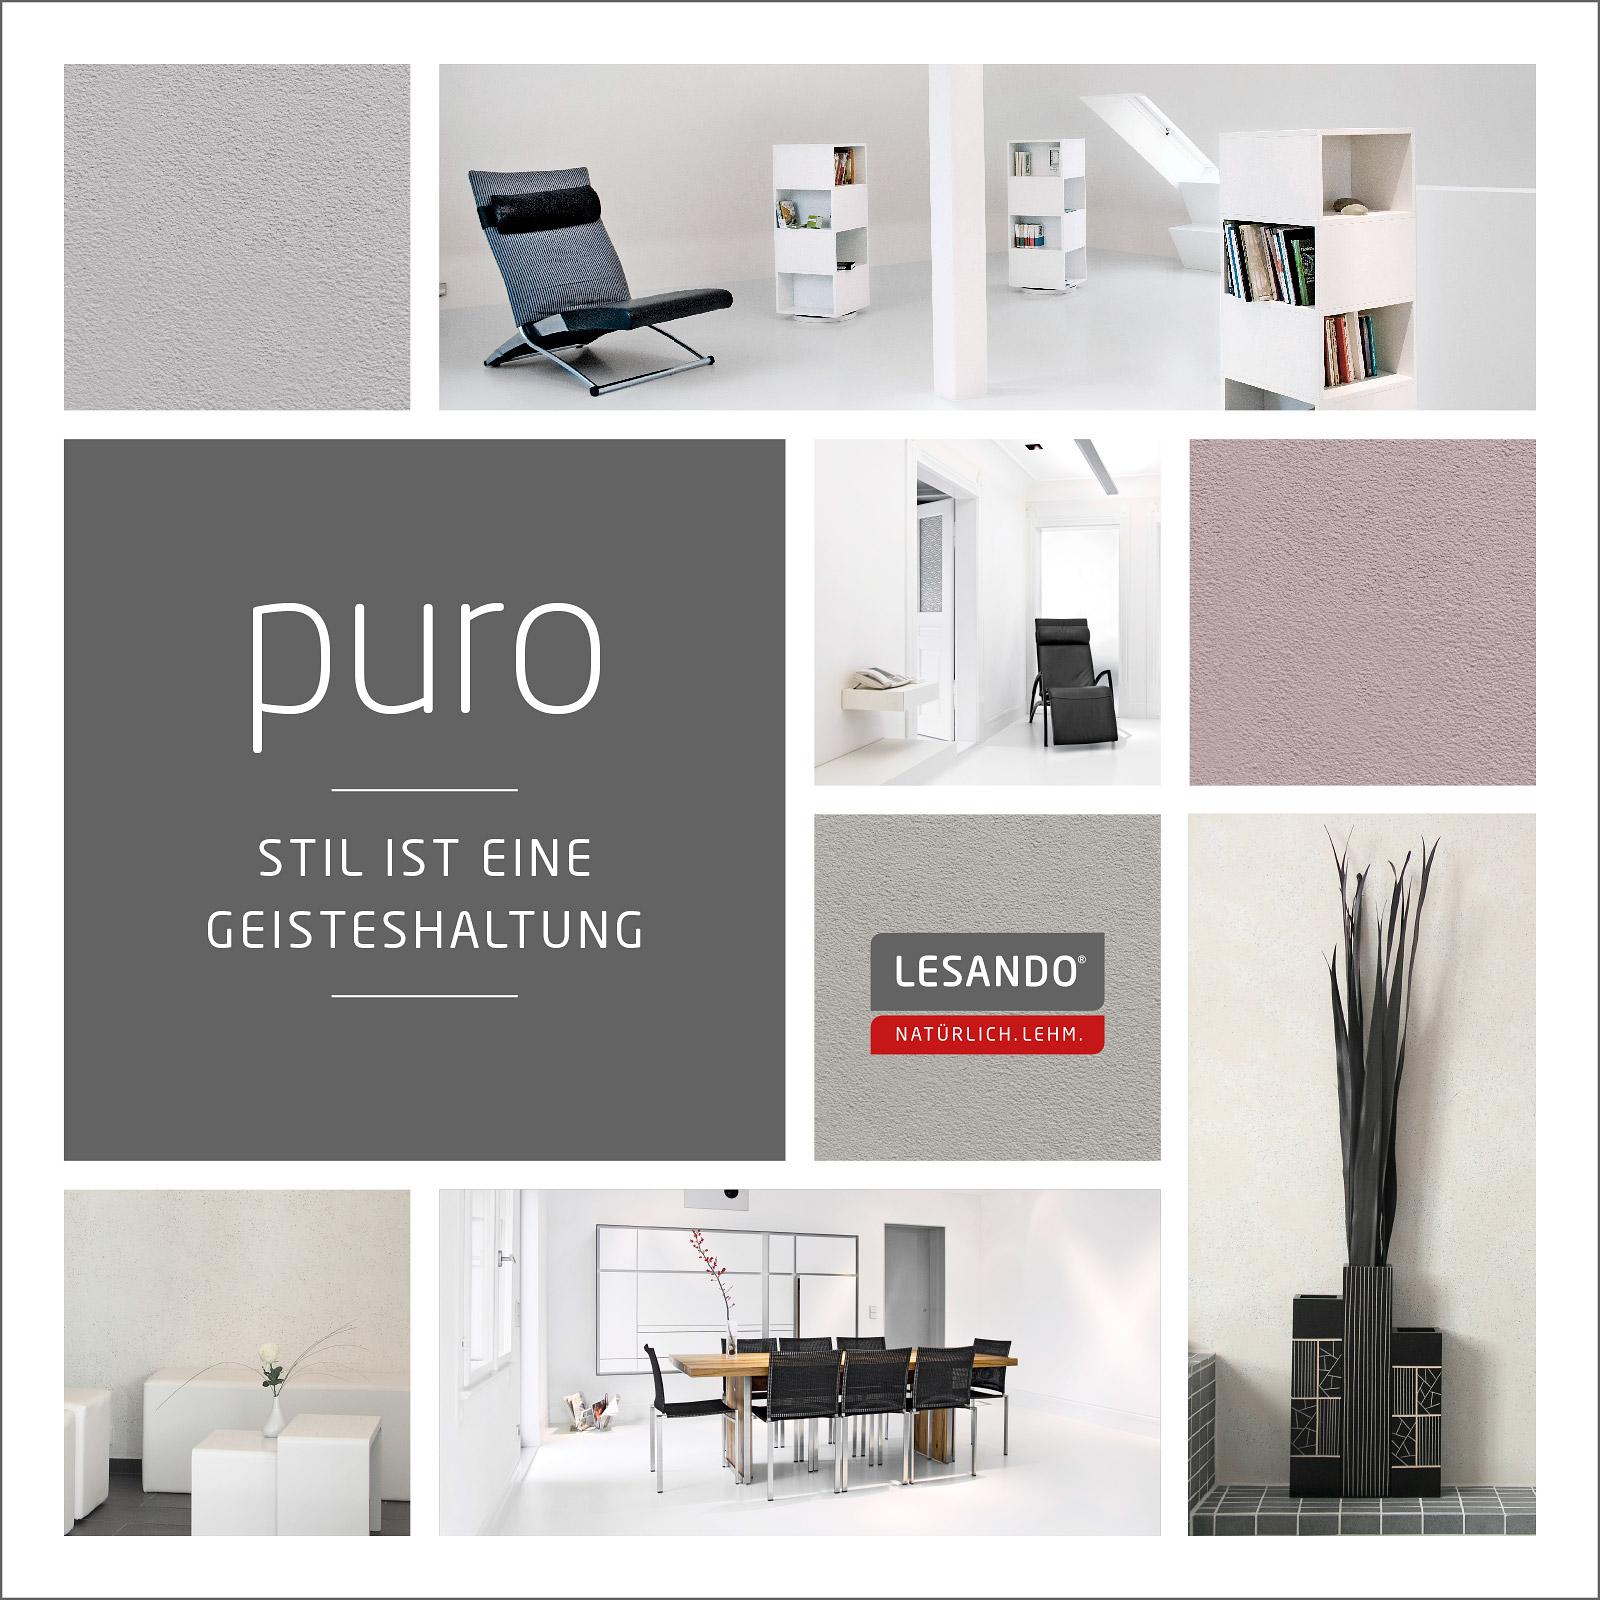 farbiger lehmputz capriccio von lesando kologischer dekorputz. Black Bedroom Furniture Sets. Home Design Ideas